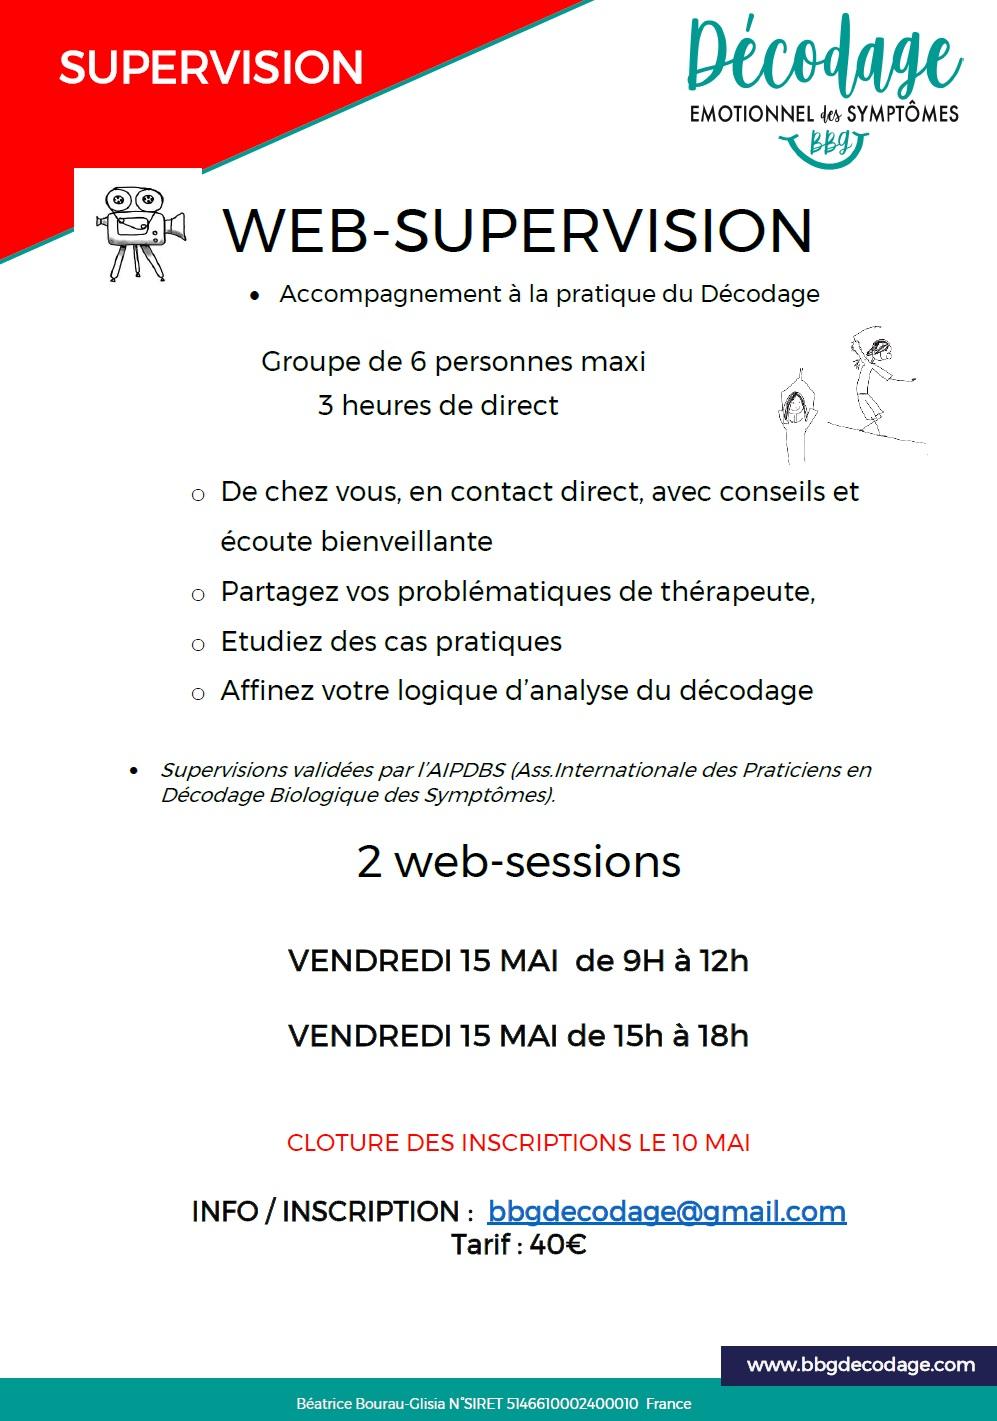 Web-supervision decodage-biologique